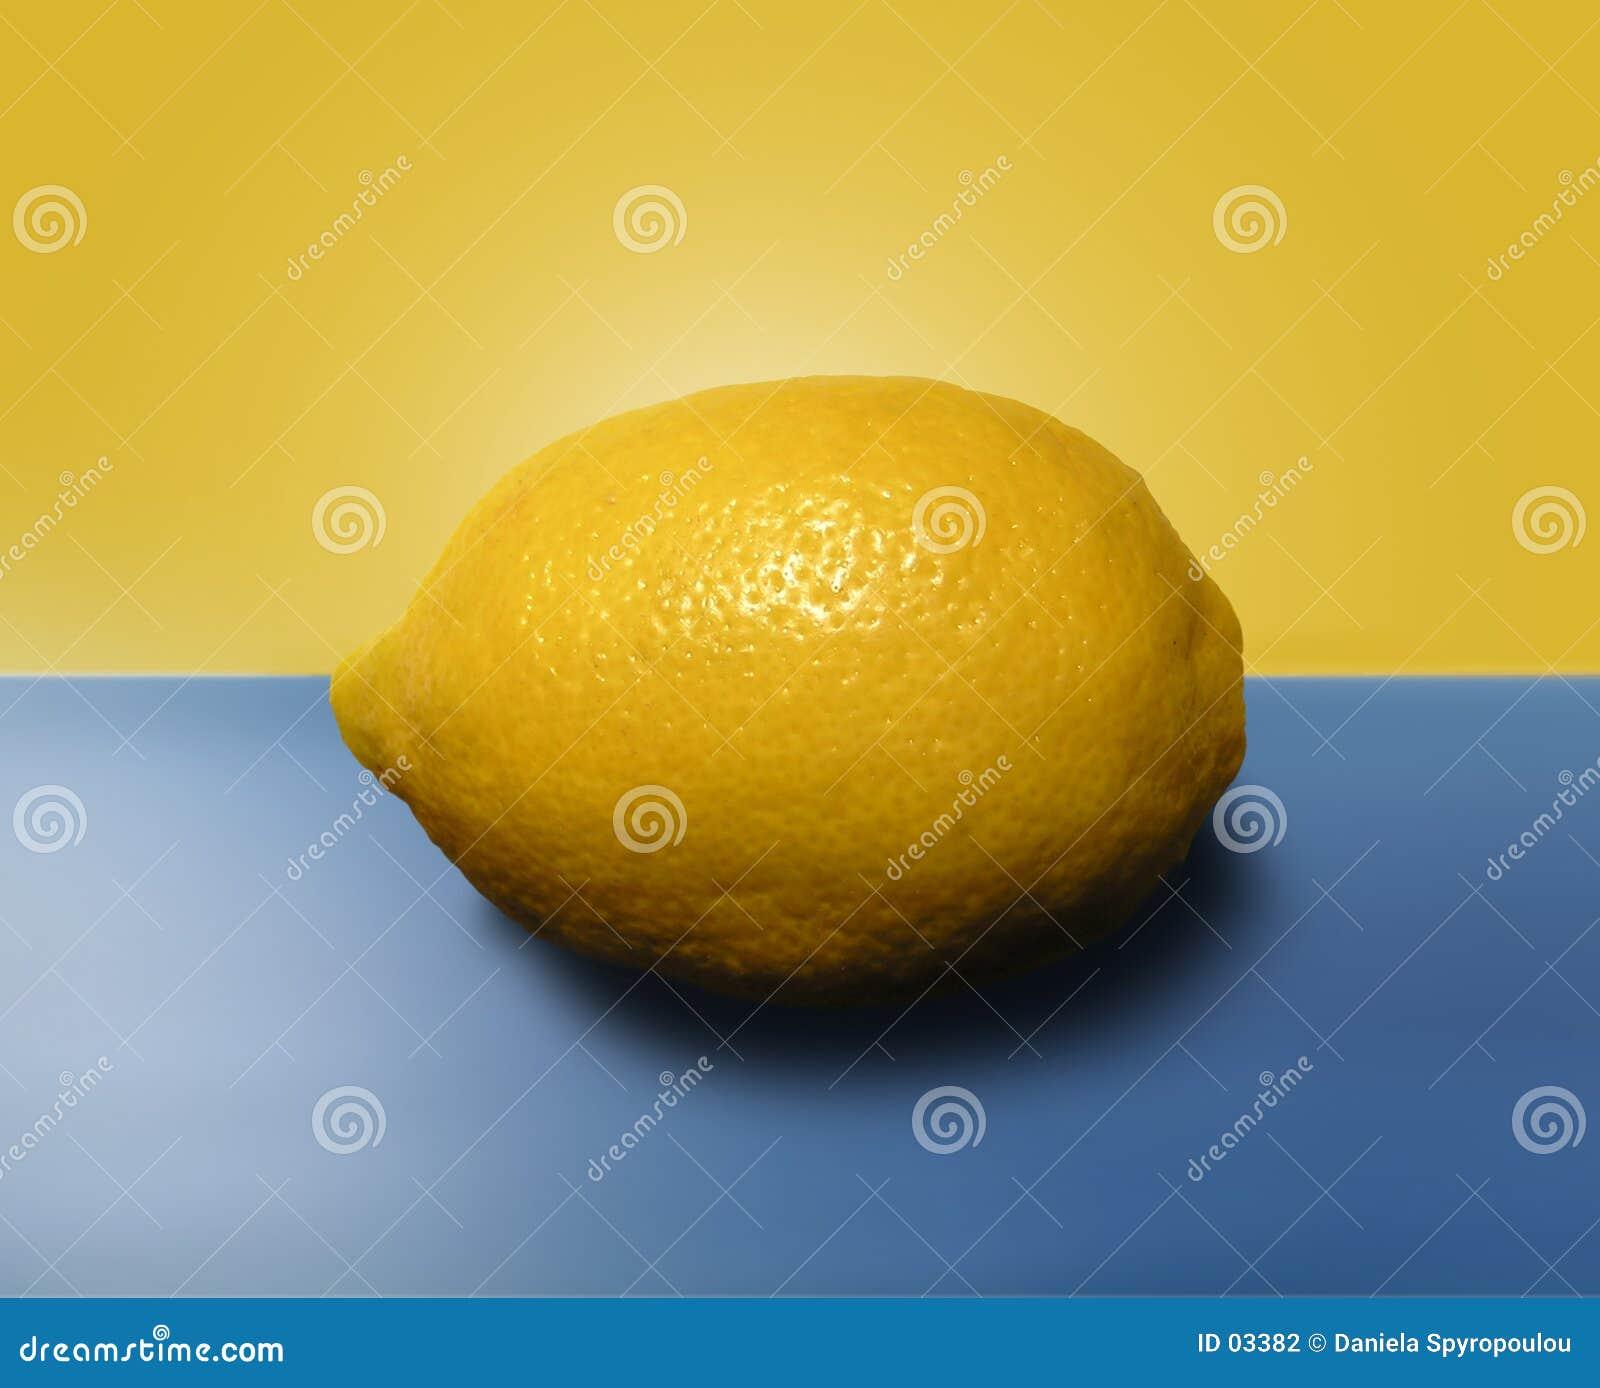 Download 柠檬 库存照片. 图片 包括有 营养, 概念, 柑橘, 表单, 表面, 对象, 柠檬酸 - 3382